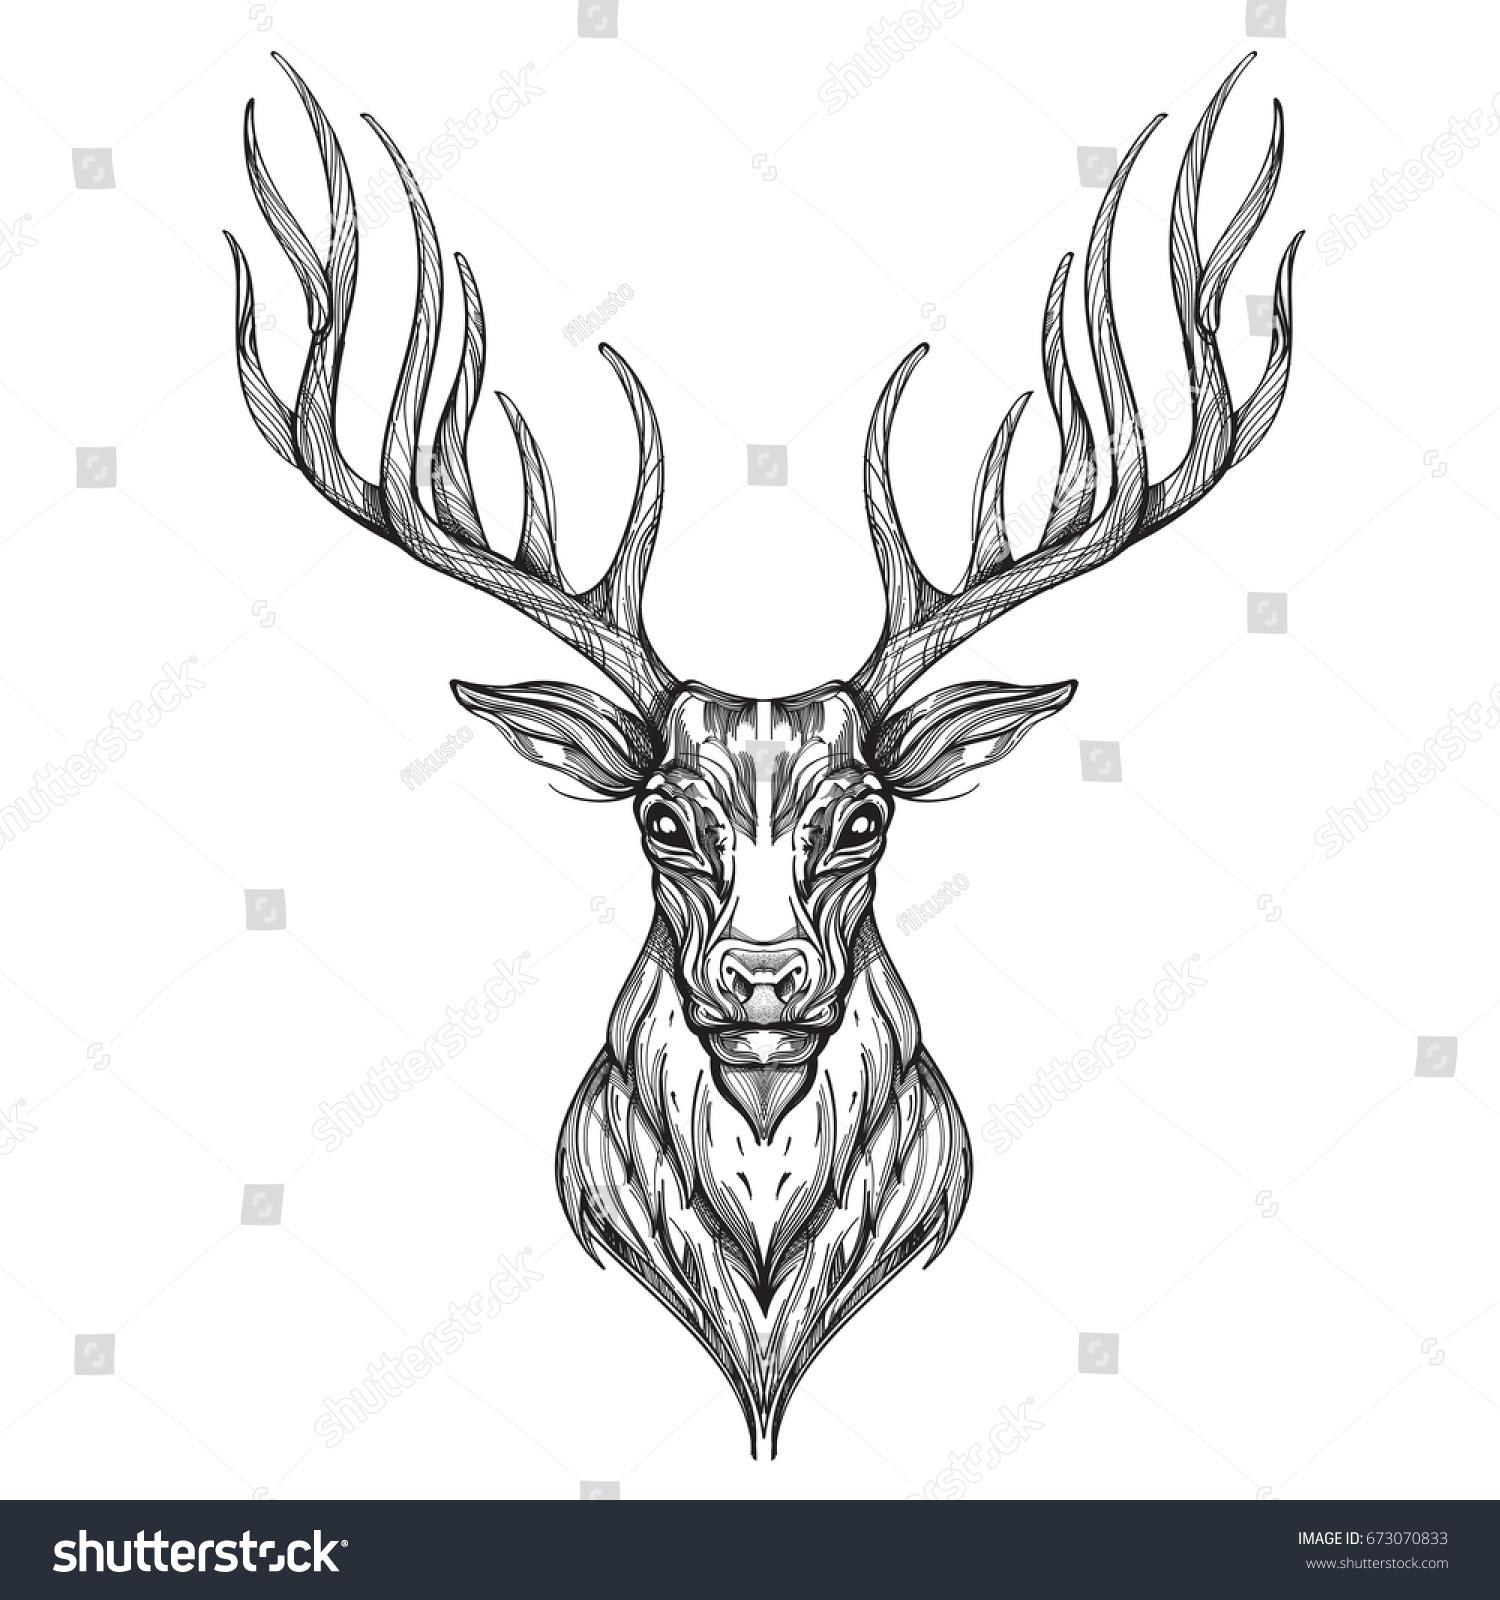 Deer Head Hand Drawn Sketch Style Stock Vector 673070833 ...